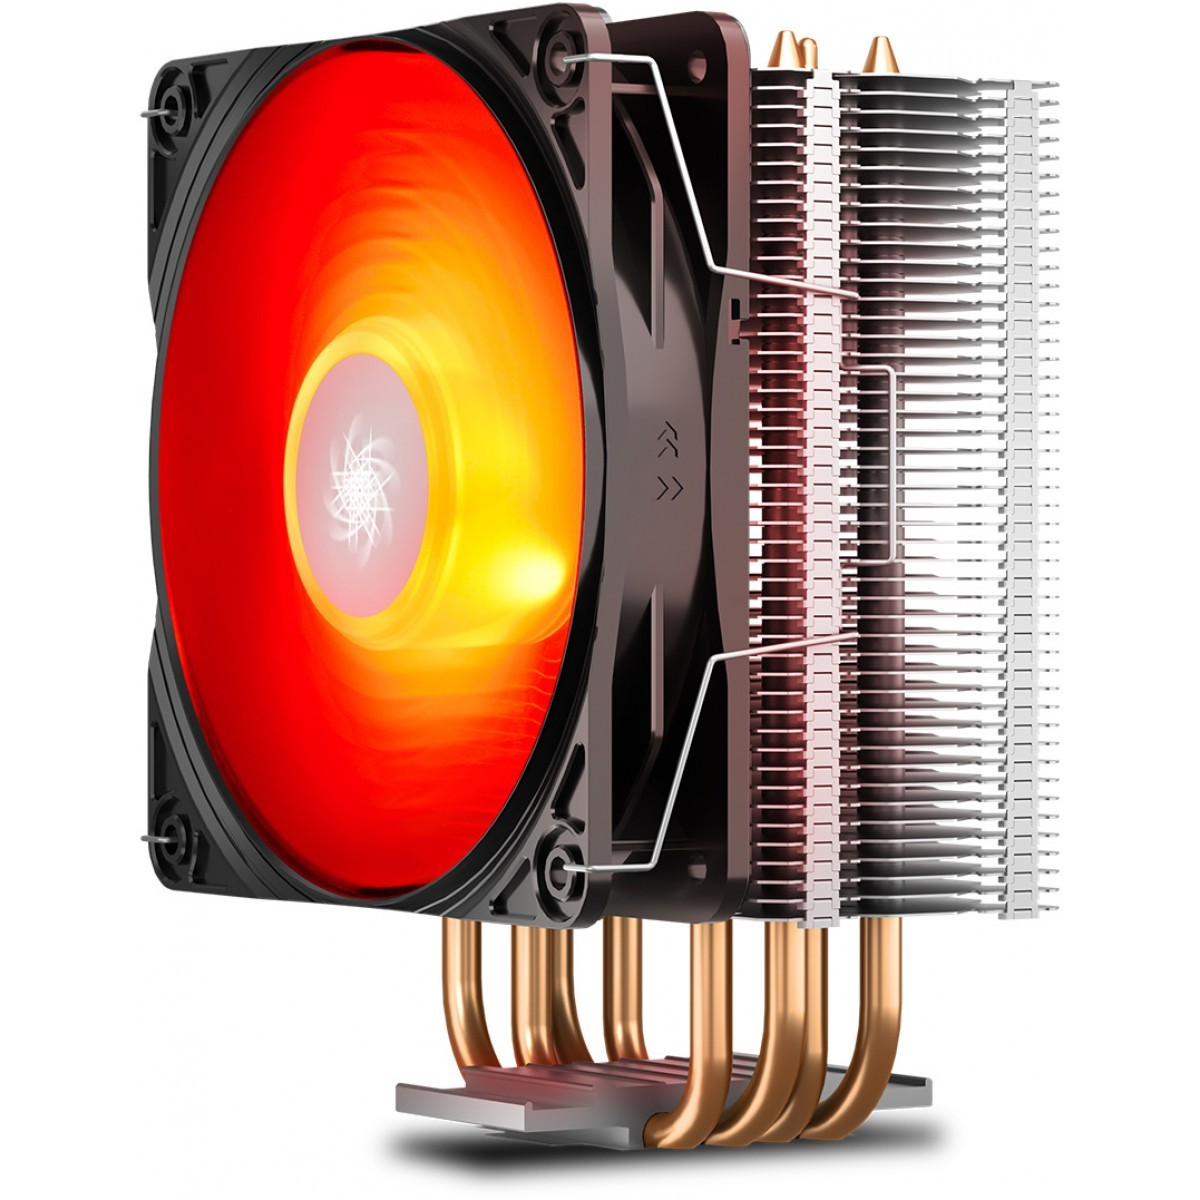 Kit Upgrade Biostar Radeon Rx 550 4GB + Ryzen 3 3300x + Biostar A320MH + Cooler de Brinde